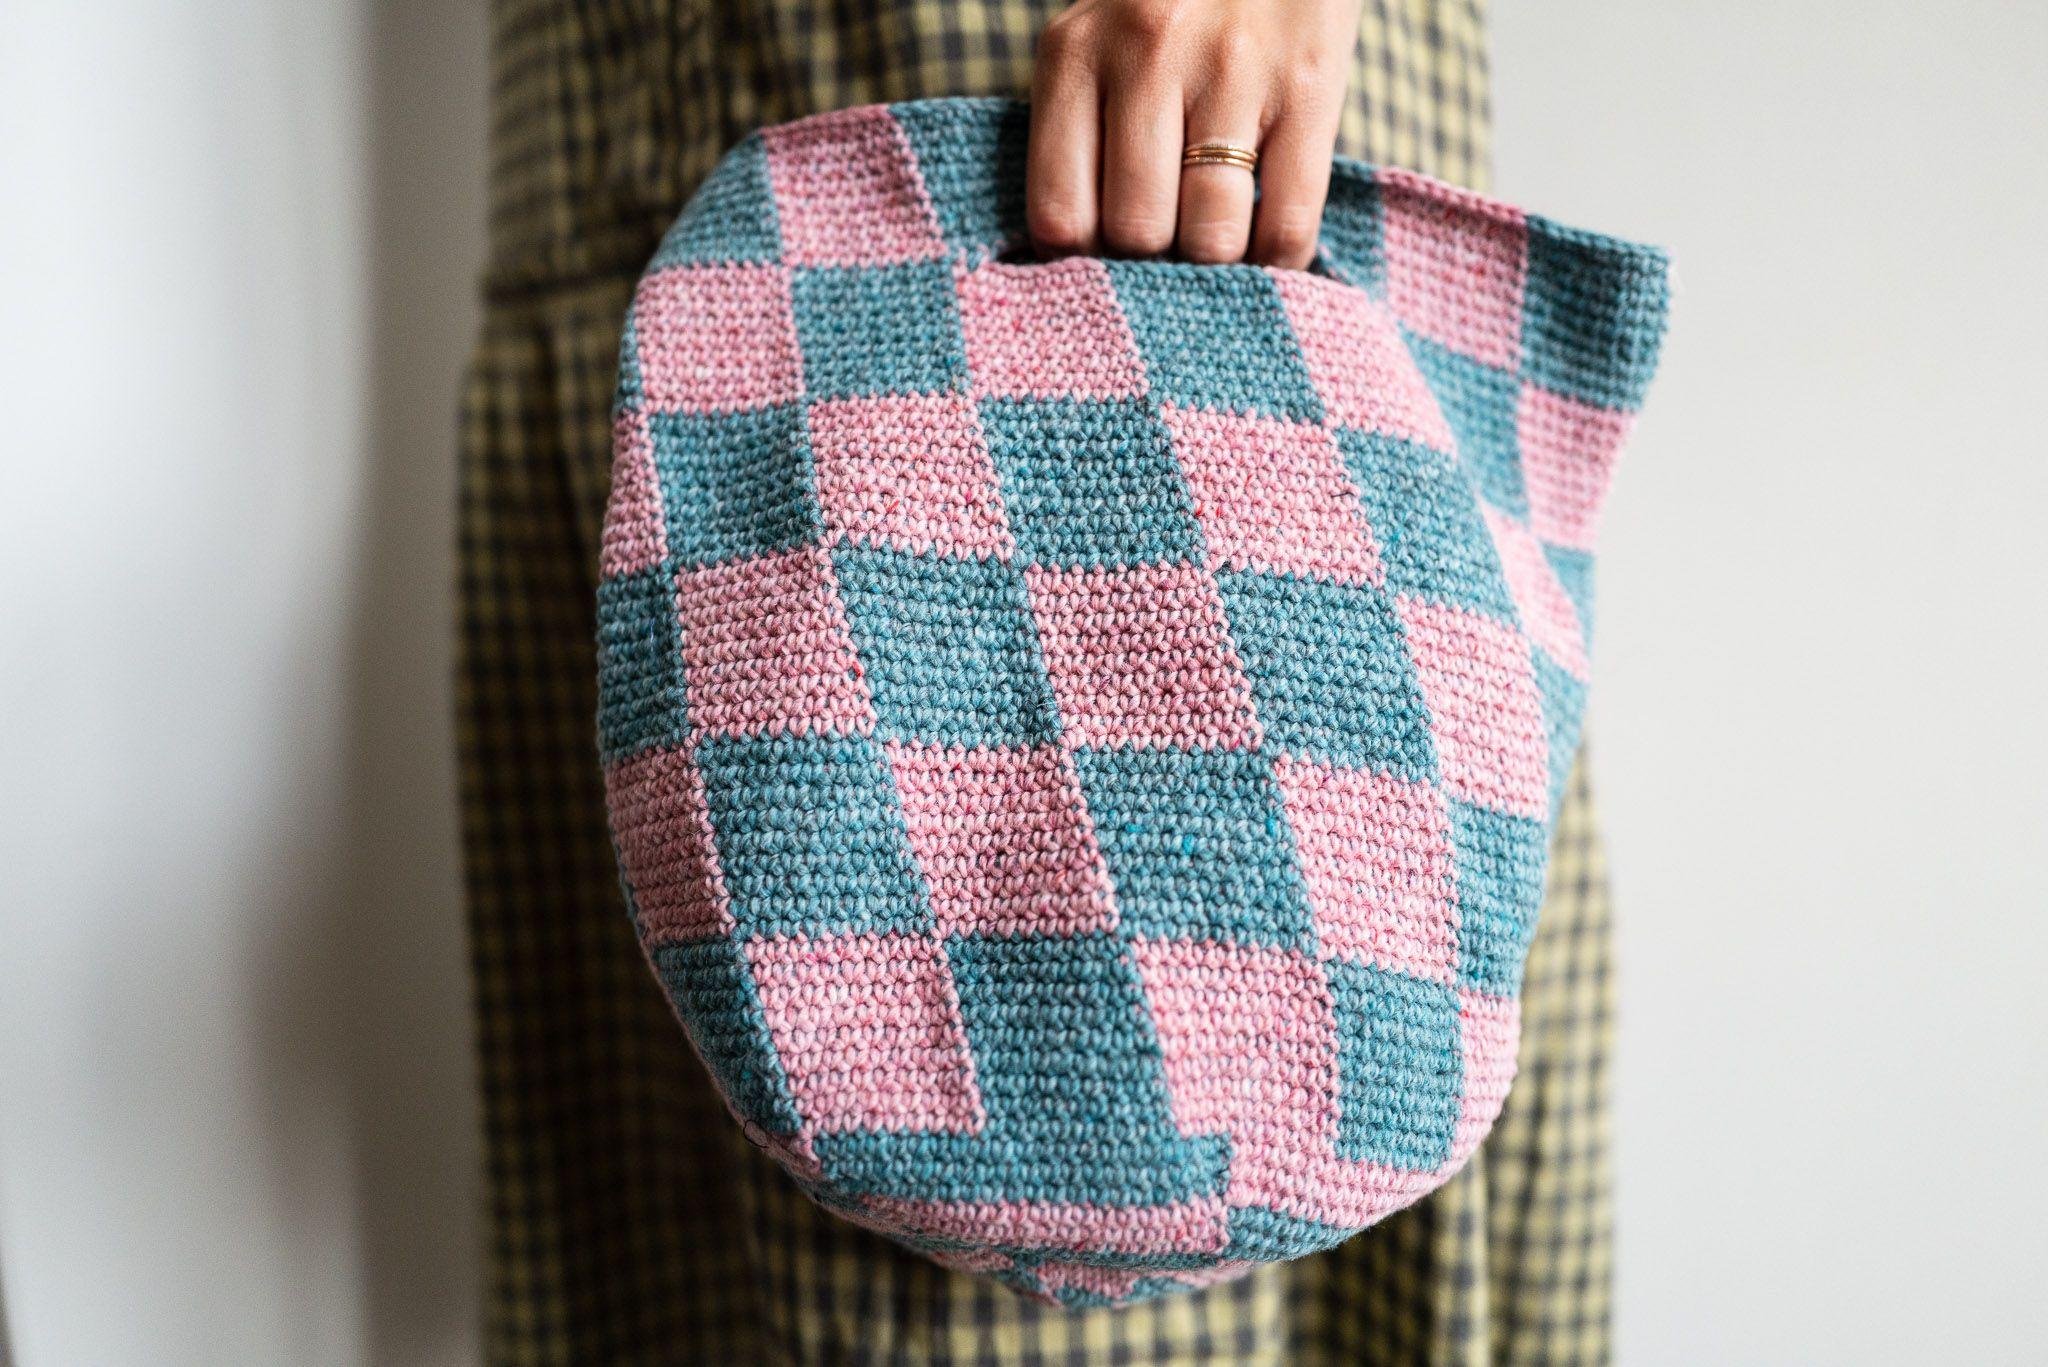 Product Image for Land N Sea Basket, Large